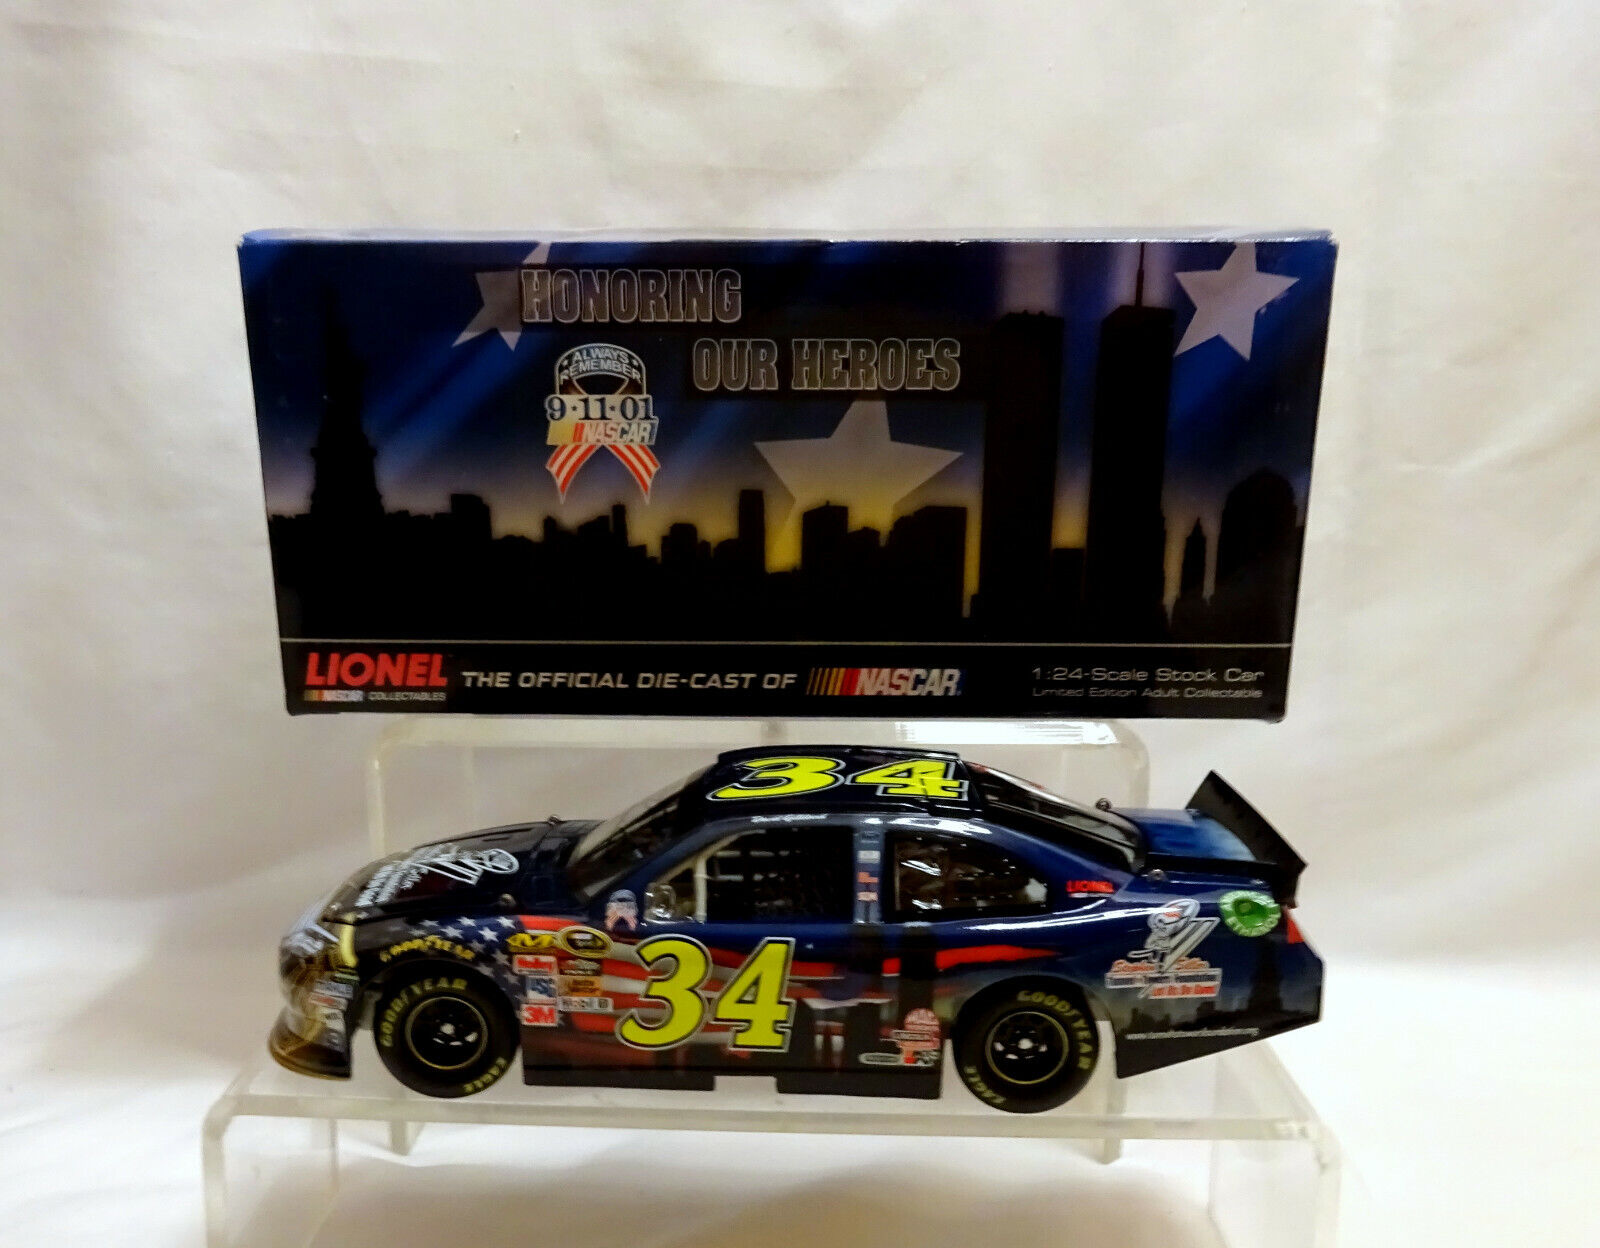 NASCAR Stephen Siller #34 Honoring the Heros 9/11 Die-Cast 1/ 500 signed  (AA16)